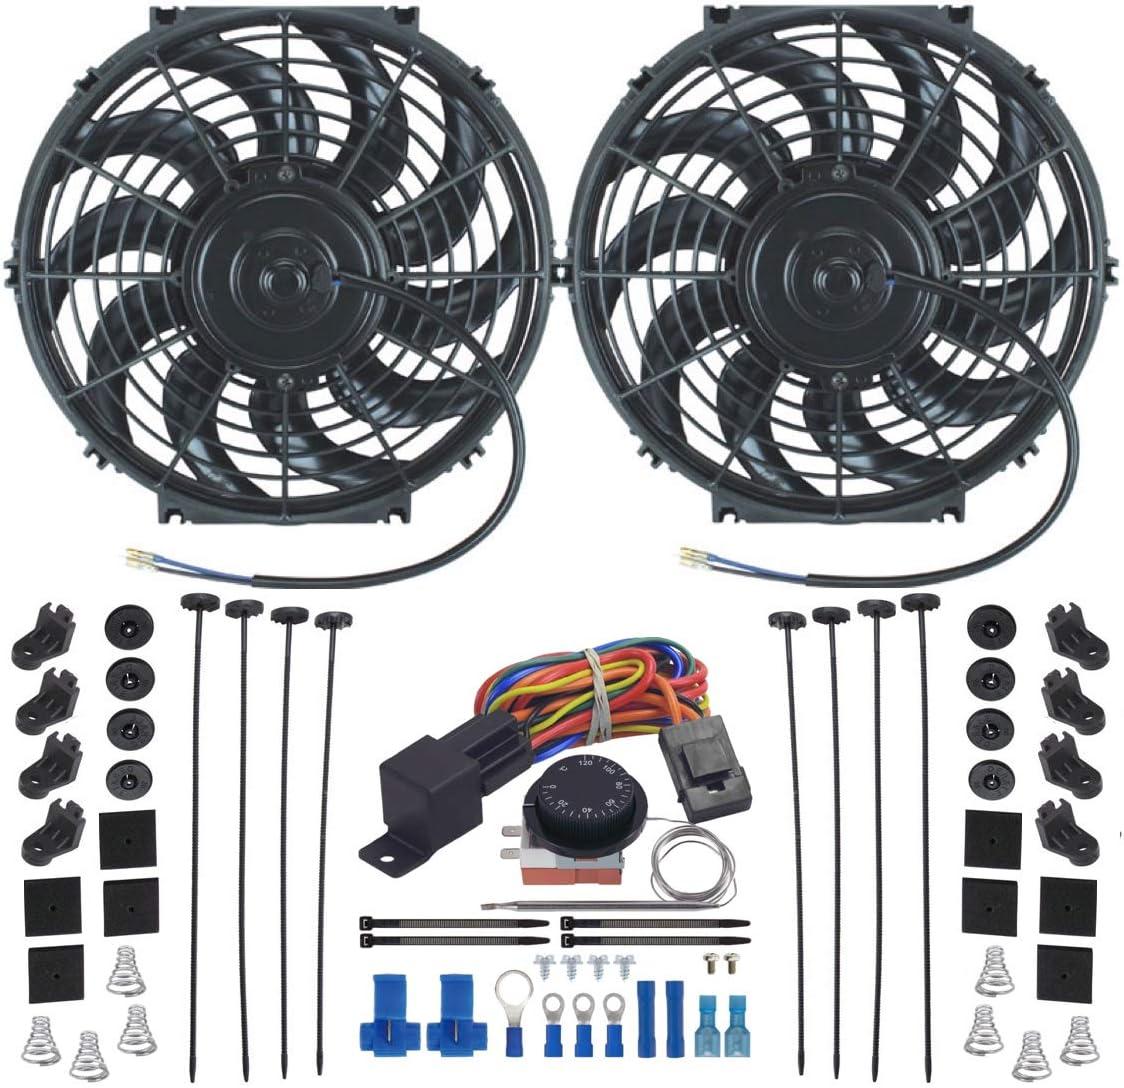 American Volt Dual Reversible 12V Motor eléctrico Radiador ...